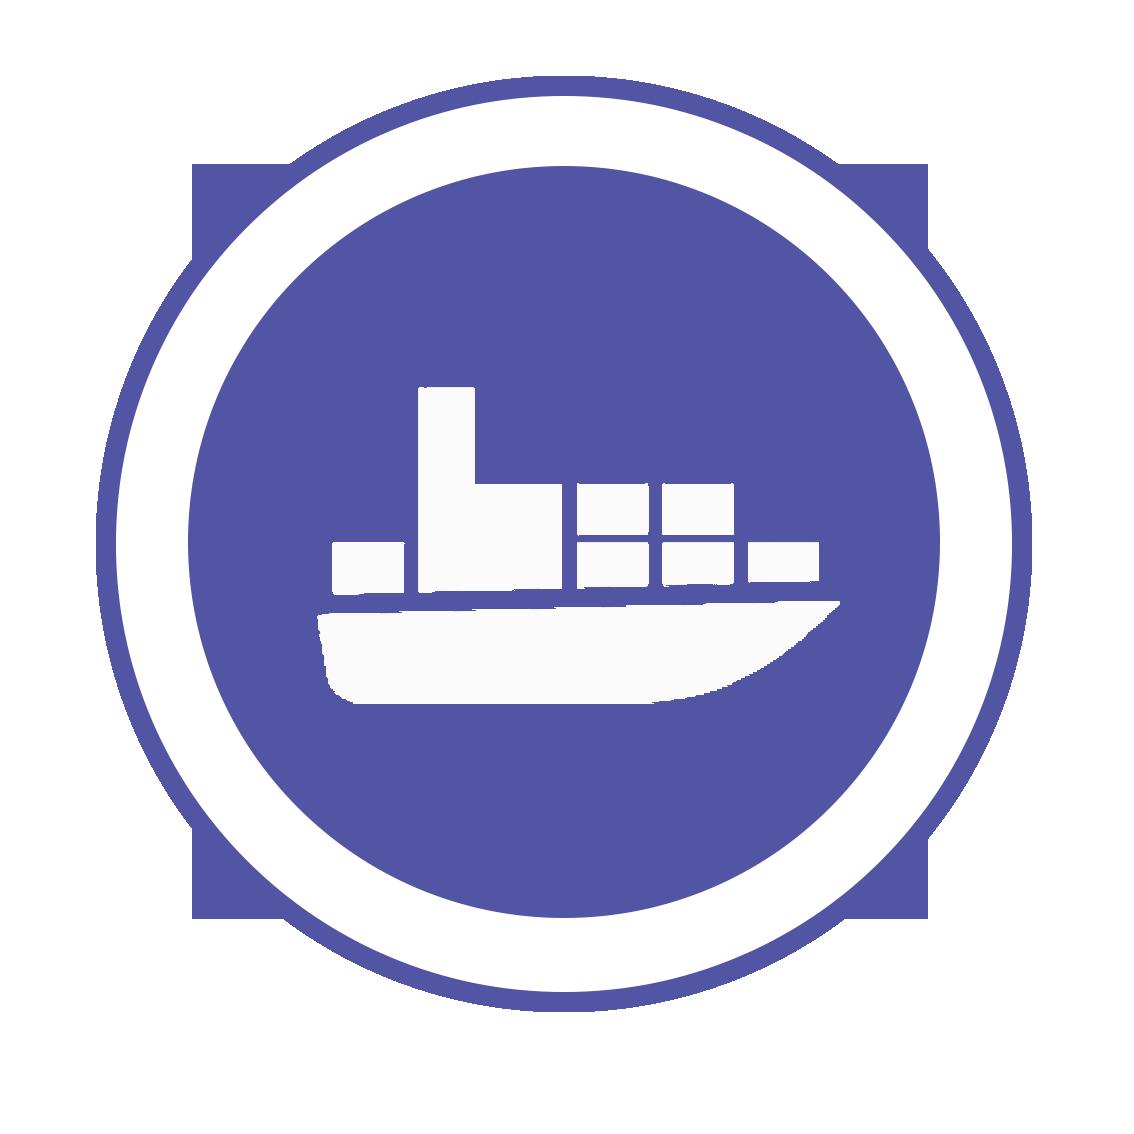 Ryley Forwading Ocean Freight Image